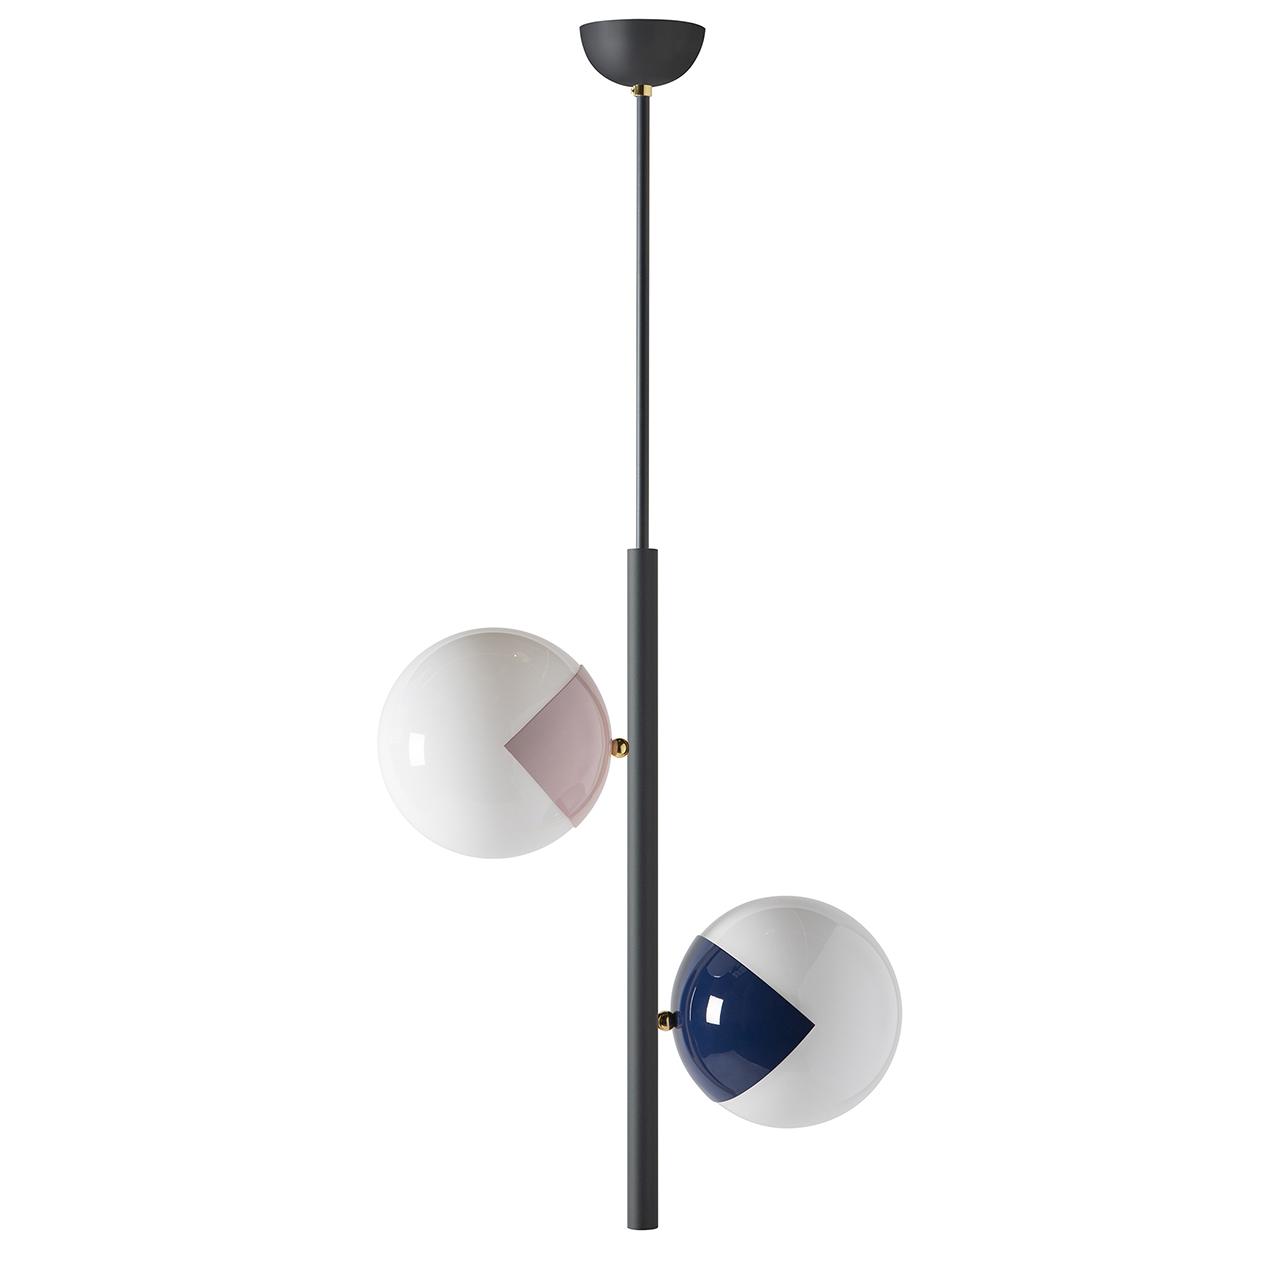 chandelier in black, rose, and blue